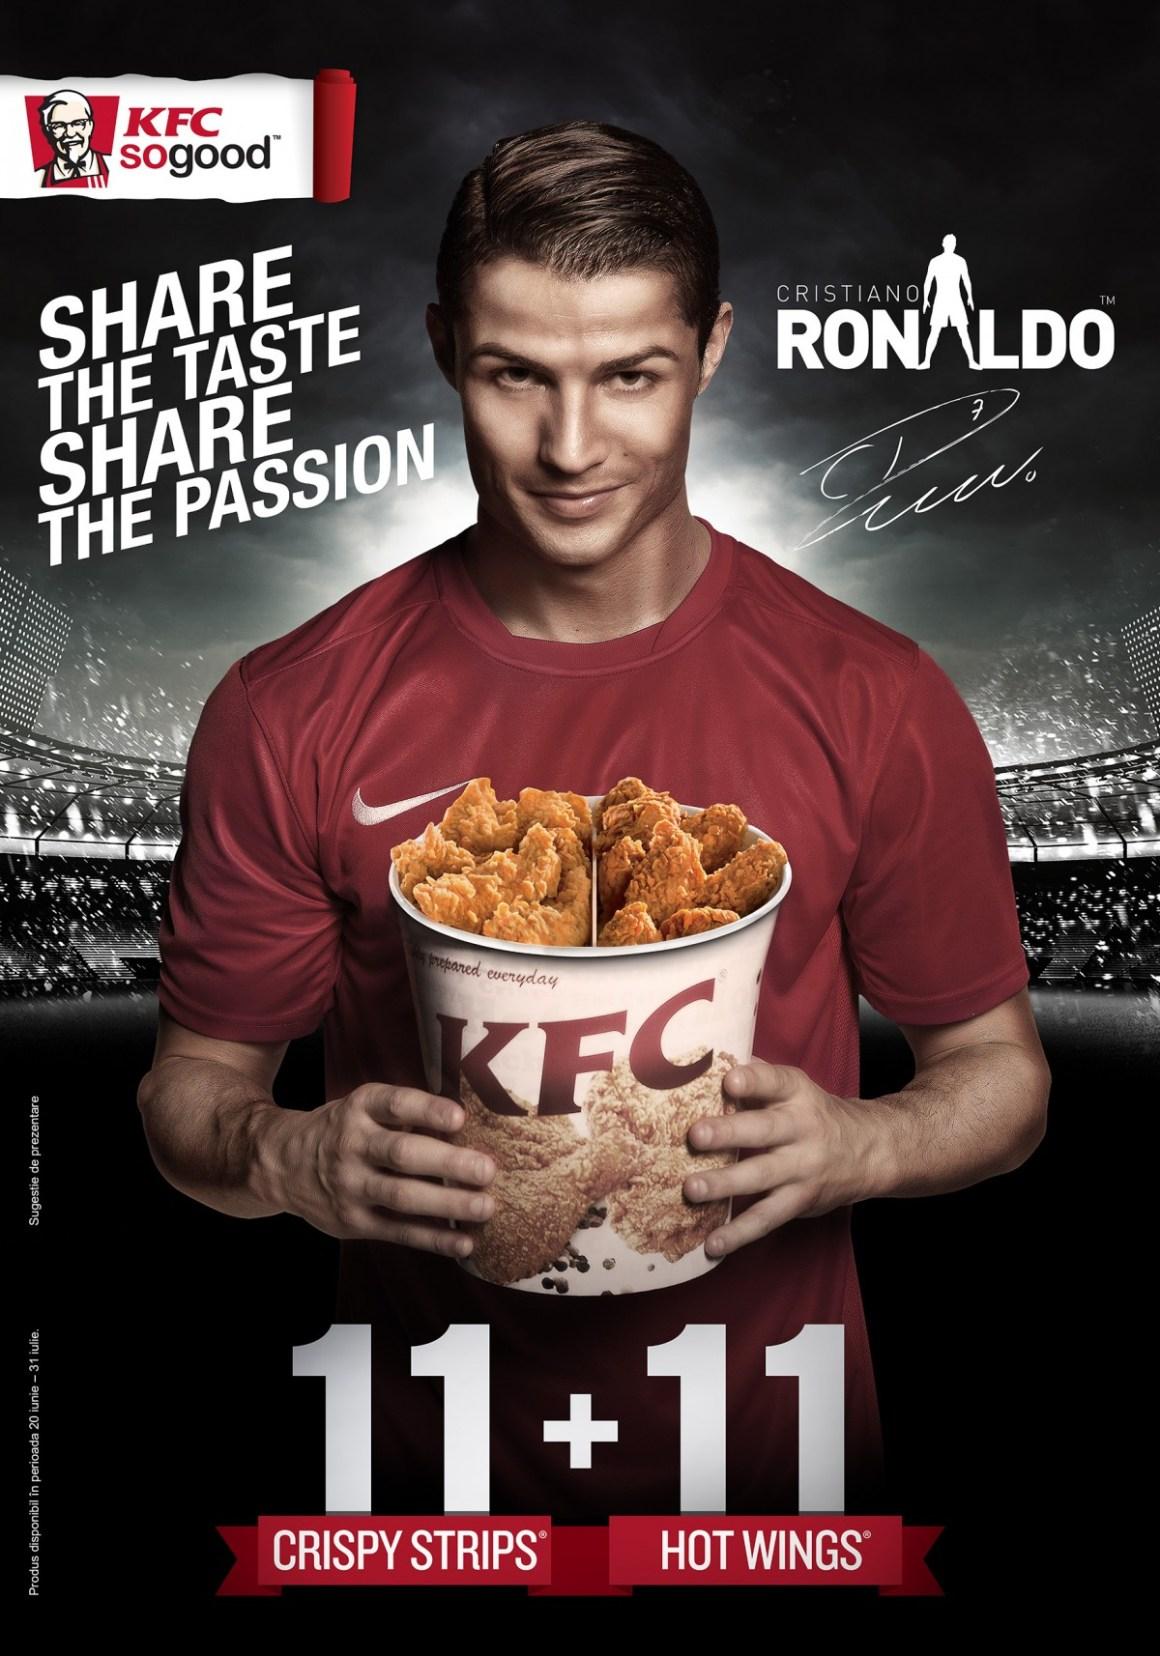 File:Campanie-kfc-cristiano-ronaldo-share-the-taste-share-the-passion-full.jpg  - Wikiversity